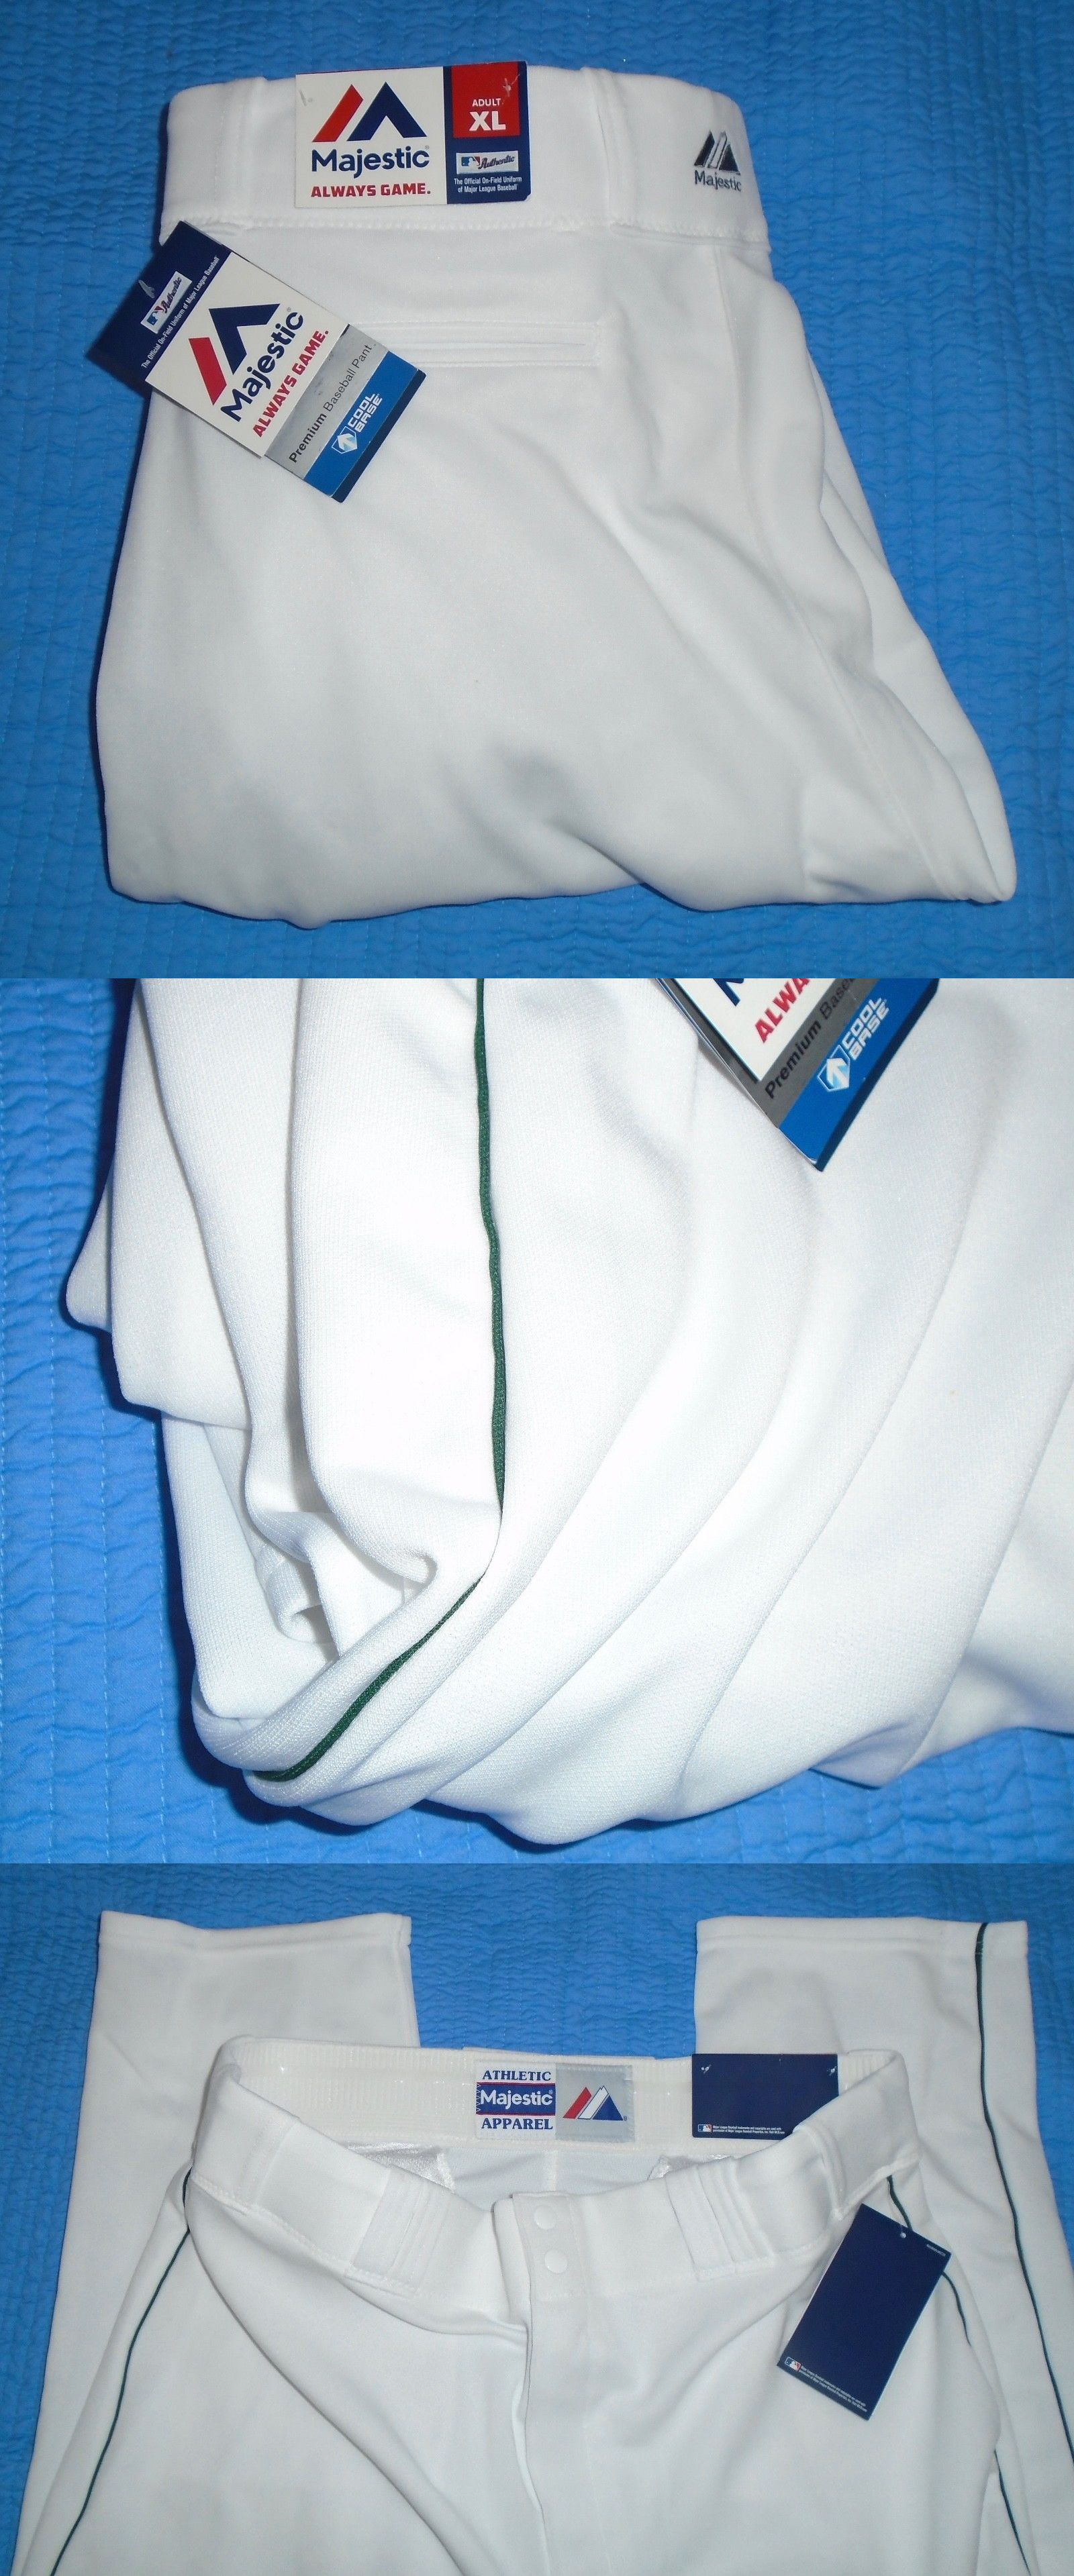 e417b8b7a Baseball Pants 181337  Majestic Mlb New Adult Size Xl Cool Base Baseball  Pants White Green